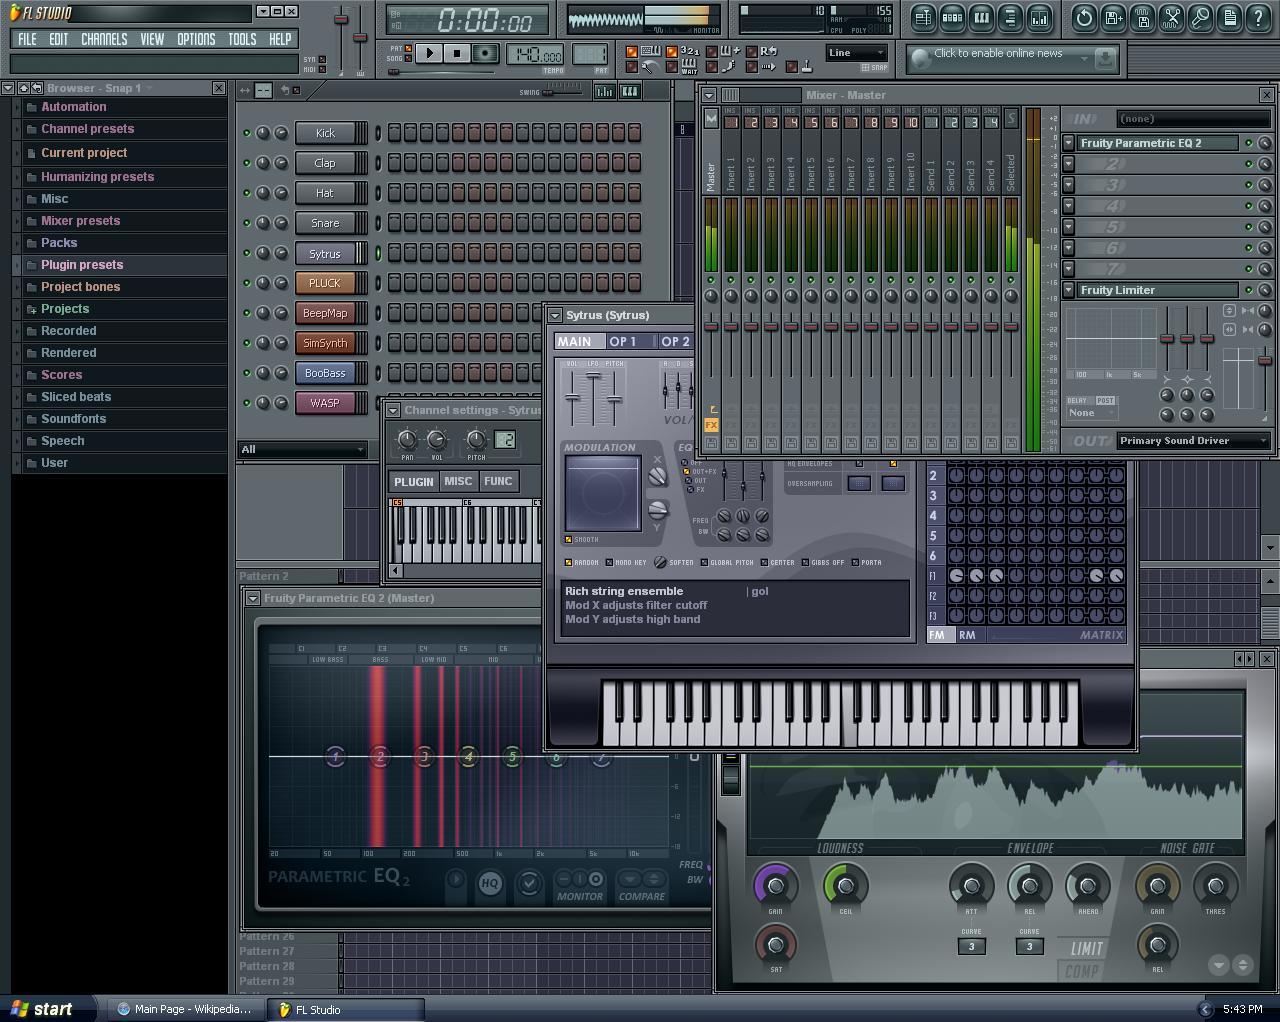 fl studio 8 free download cracked